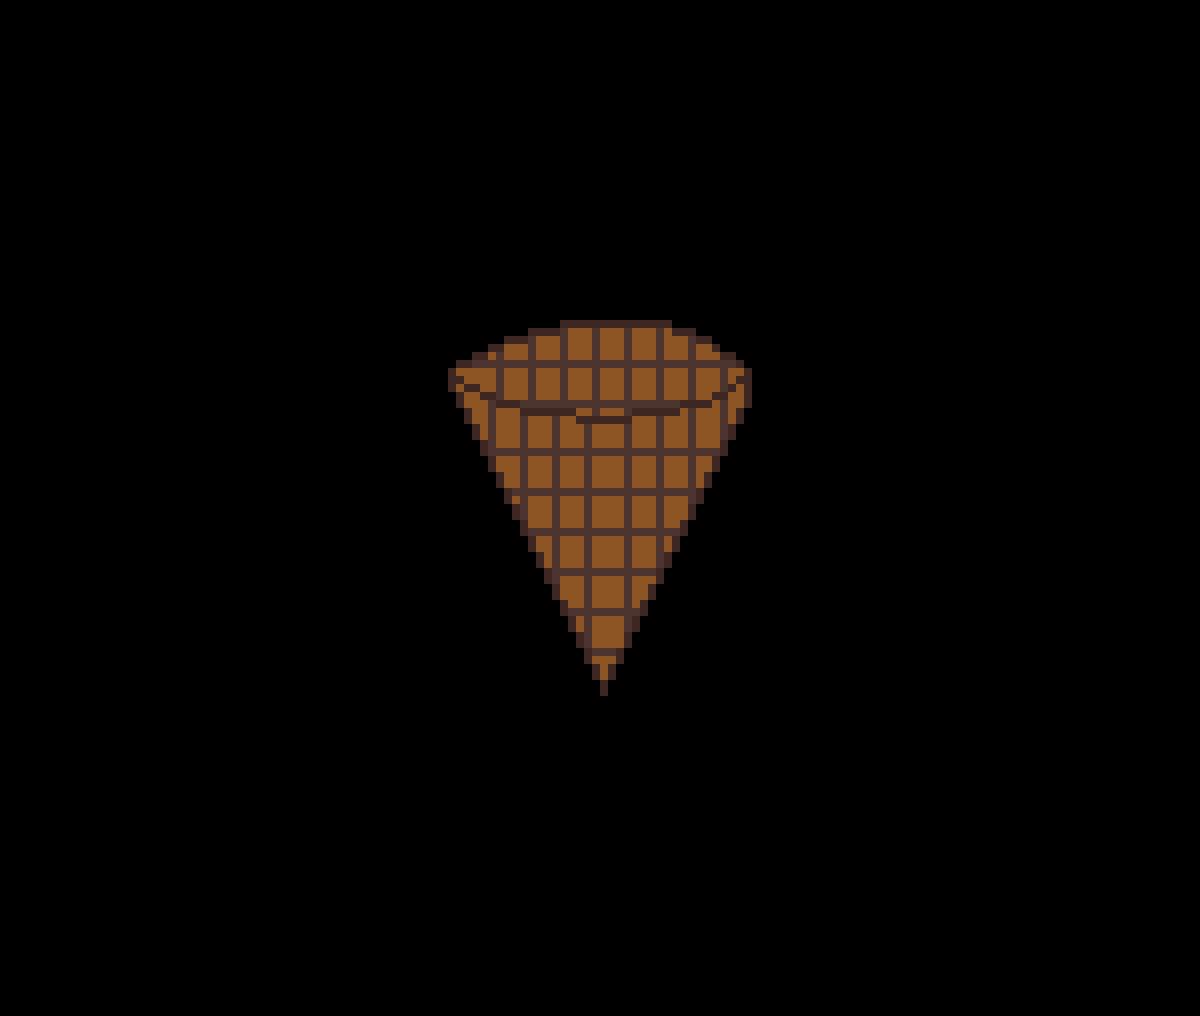 Ice cream cone by Jrwolfen